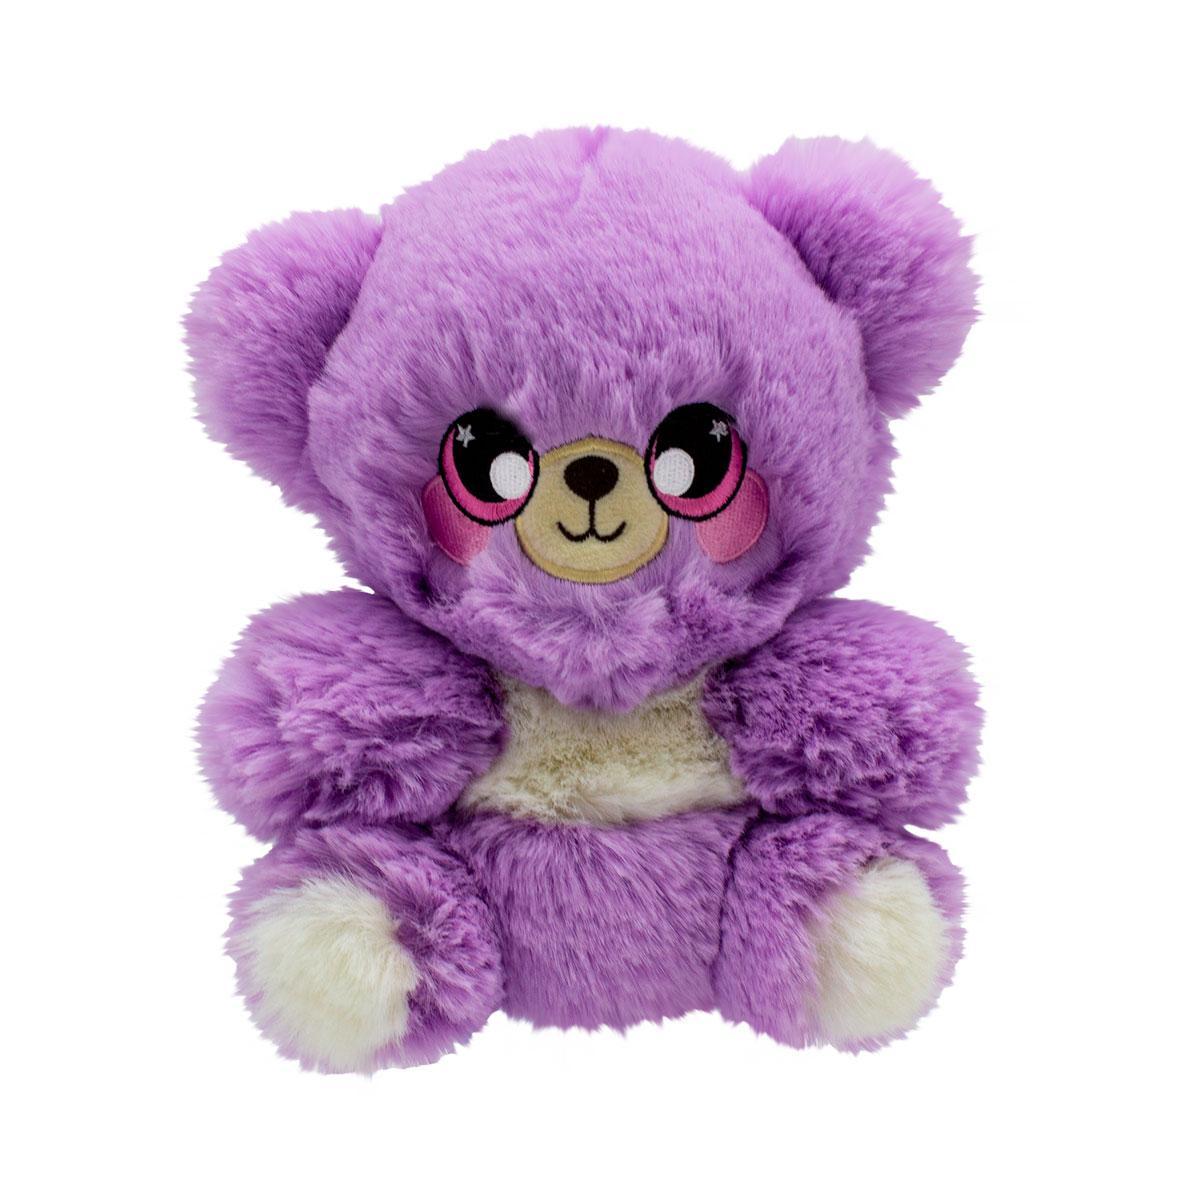 Squeezamals Ароматная мягкая игрушка Мишка Бакстер - серии 3-Deez Deluxe, SQ00939-5008